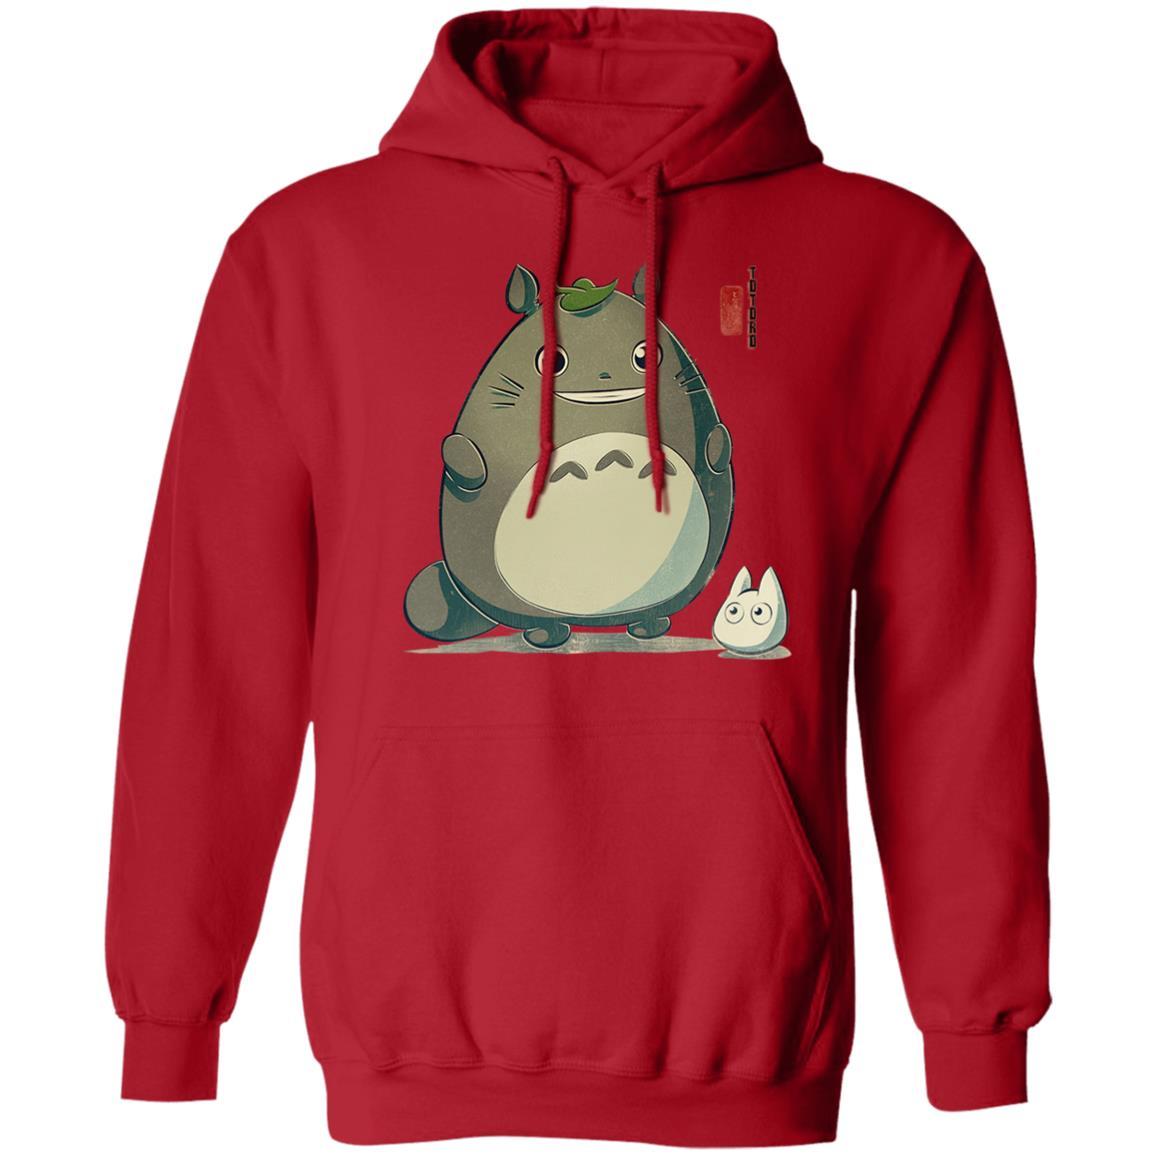 Totoro Cute Chibi Hoodie